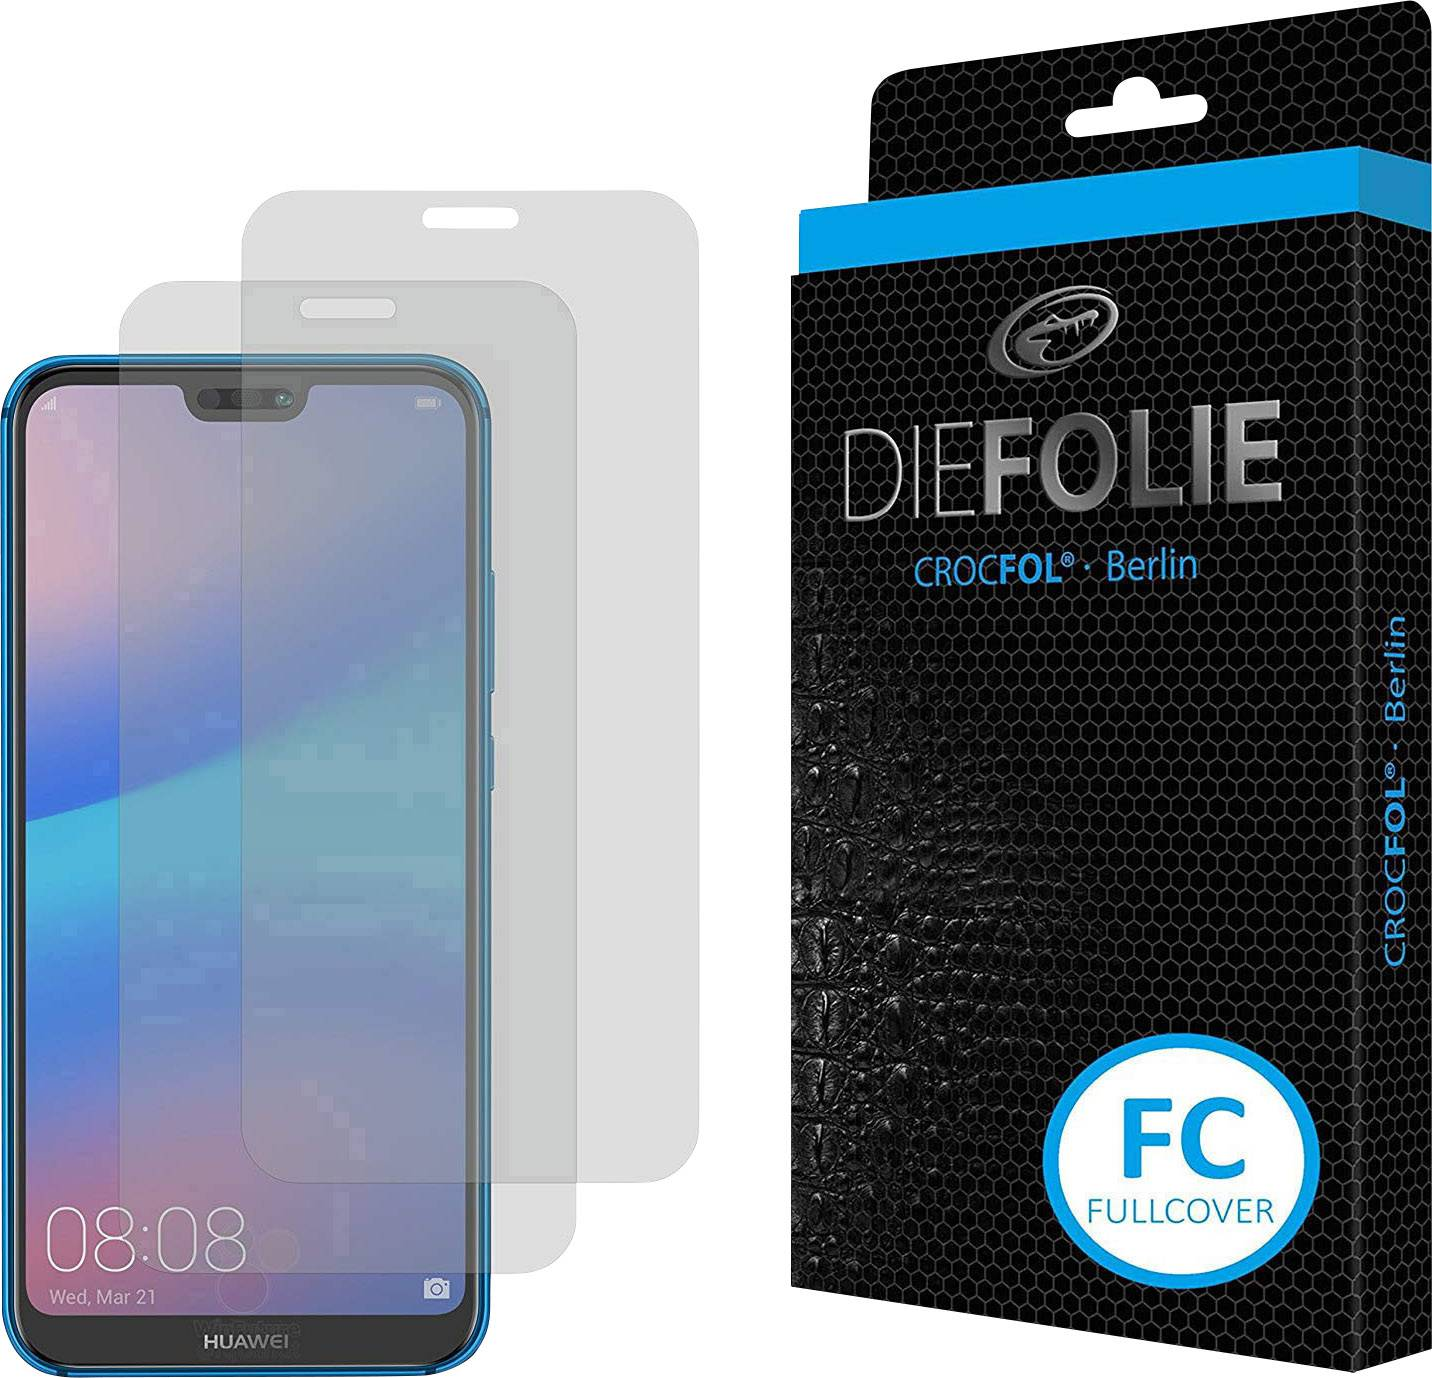 Crocfol Die Folie Fullcover Film Compatible With Huawei P20 Lite Conrad Com